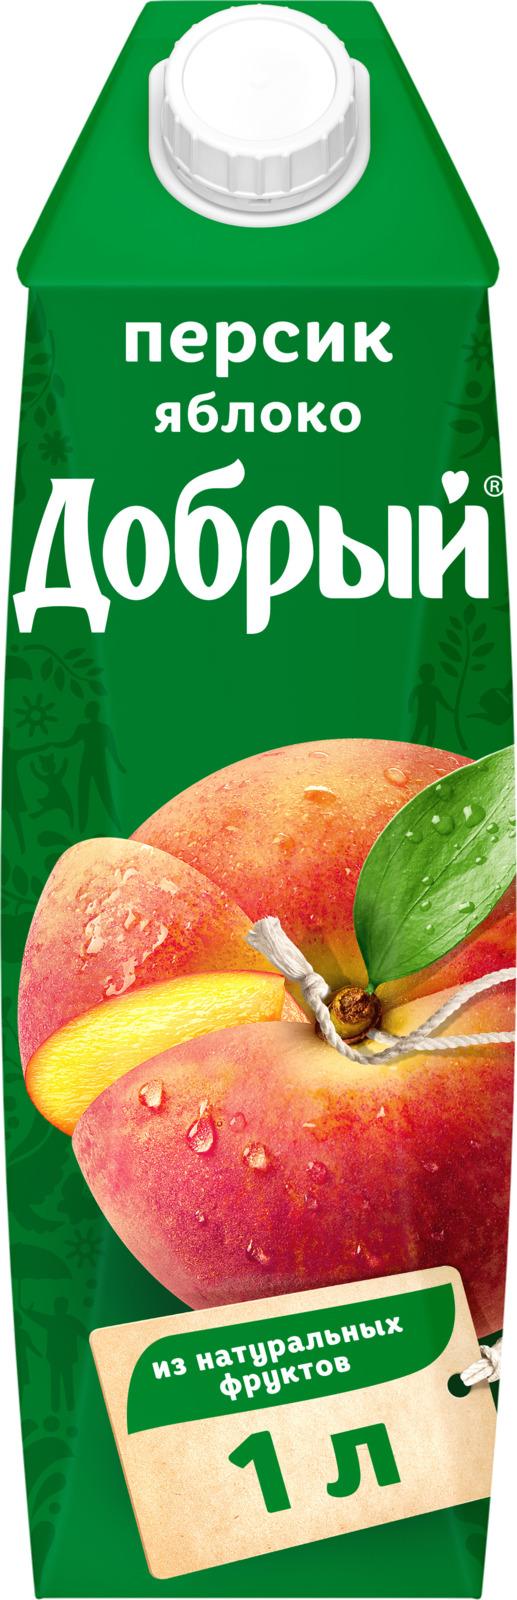 Нектар Добрый Персик Яблоко, 1 л нектар добрый мультифрут